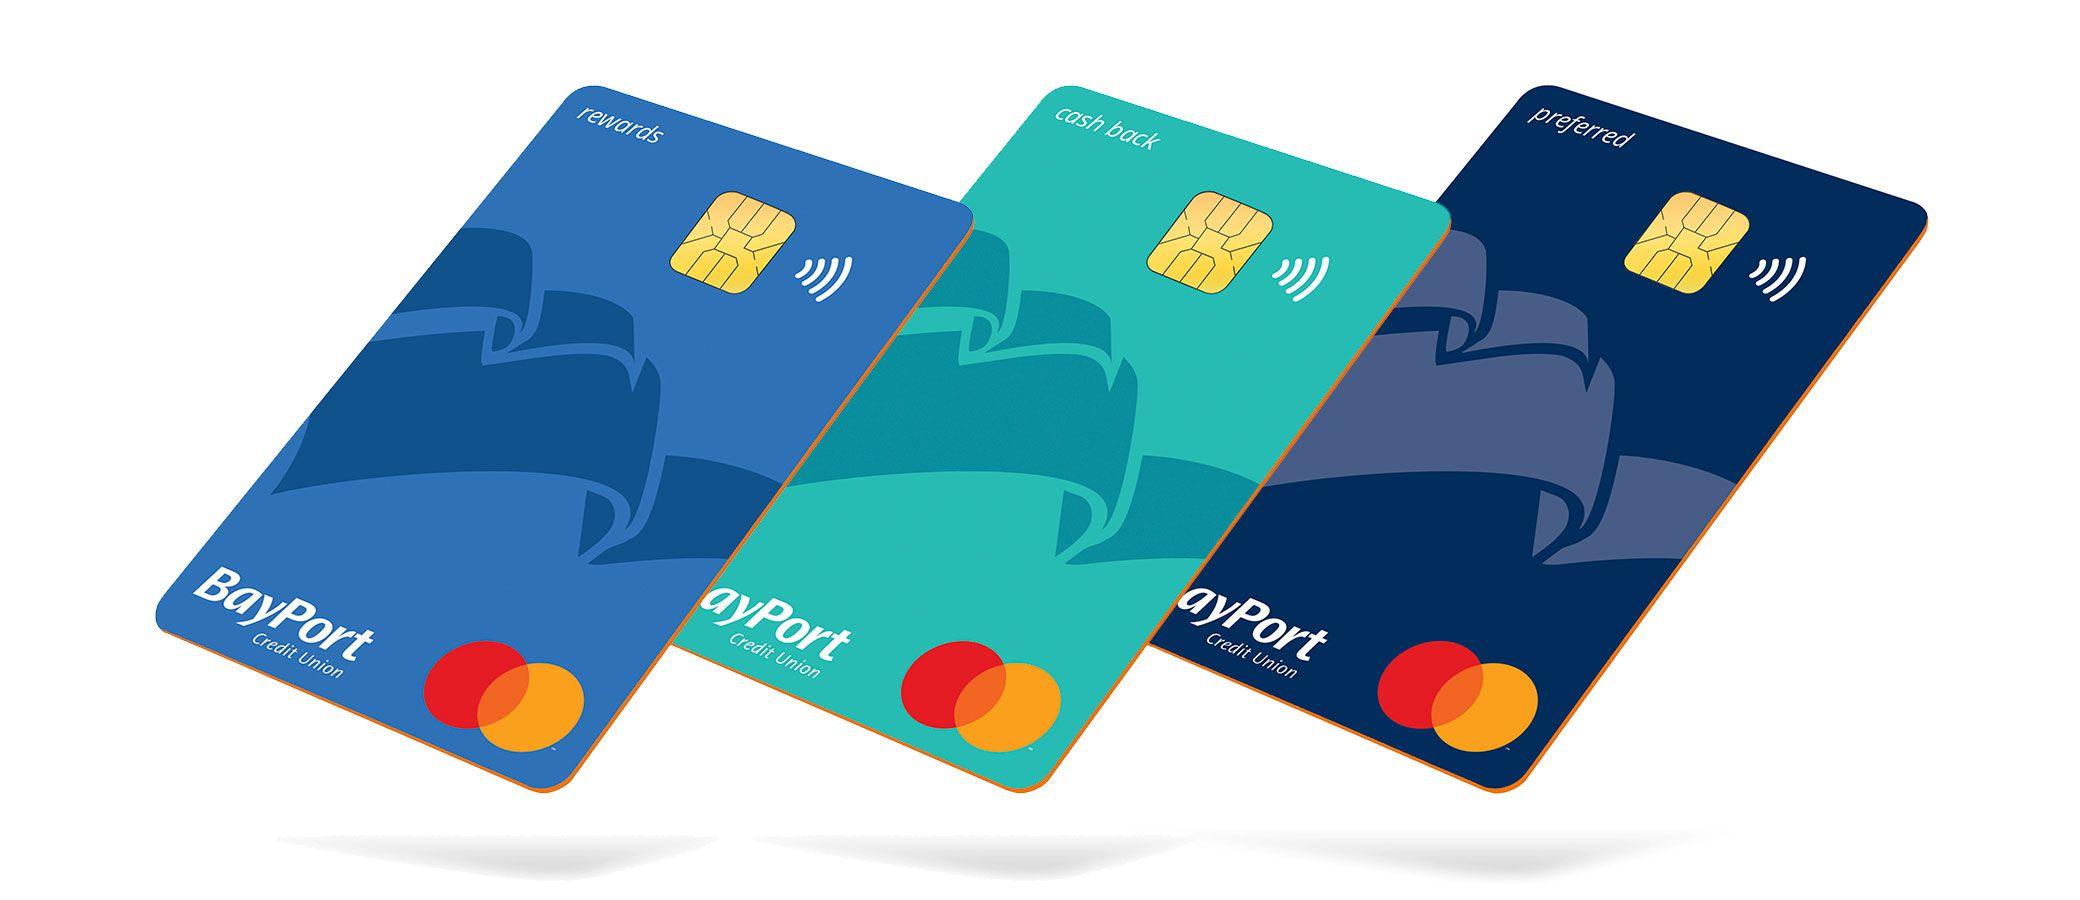 BayPort contactless credit cards